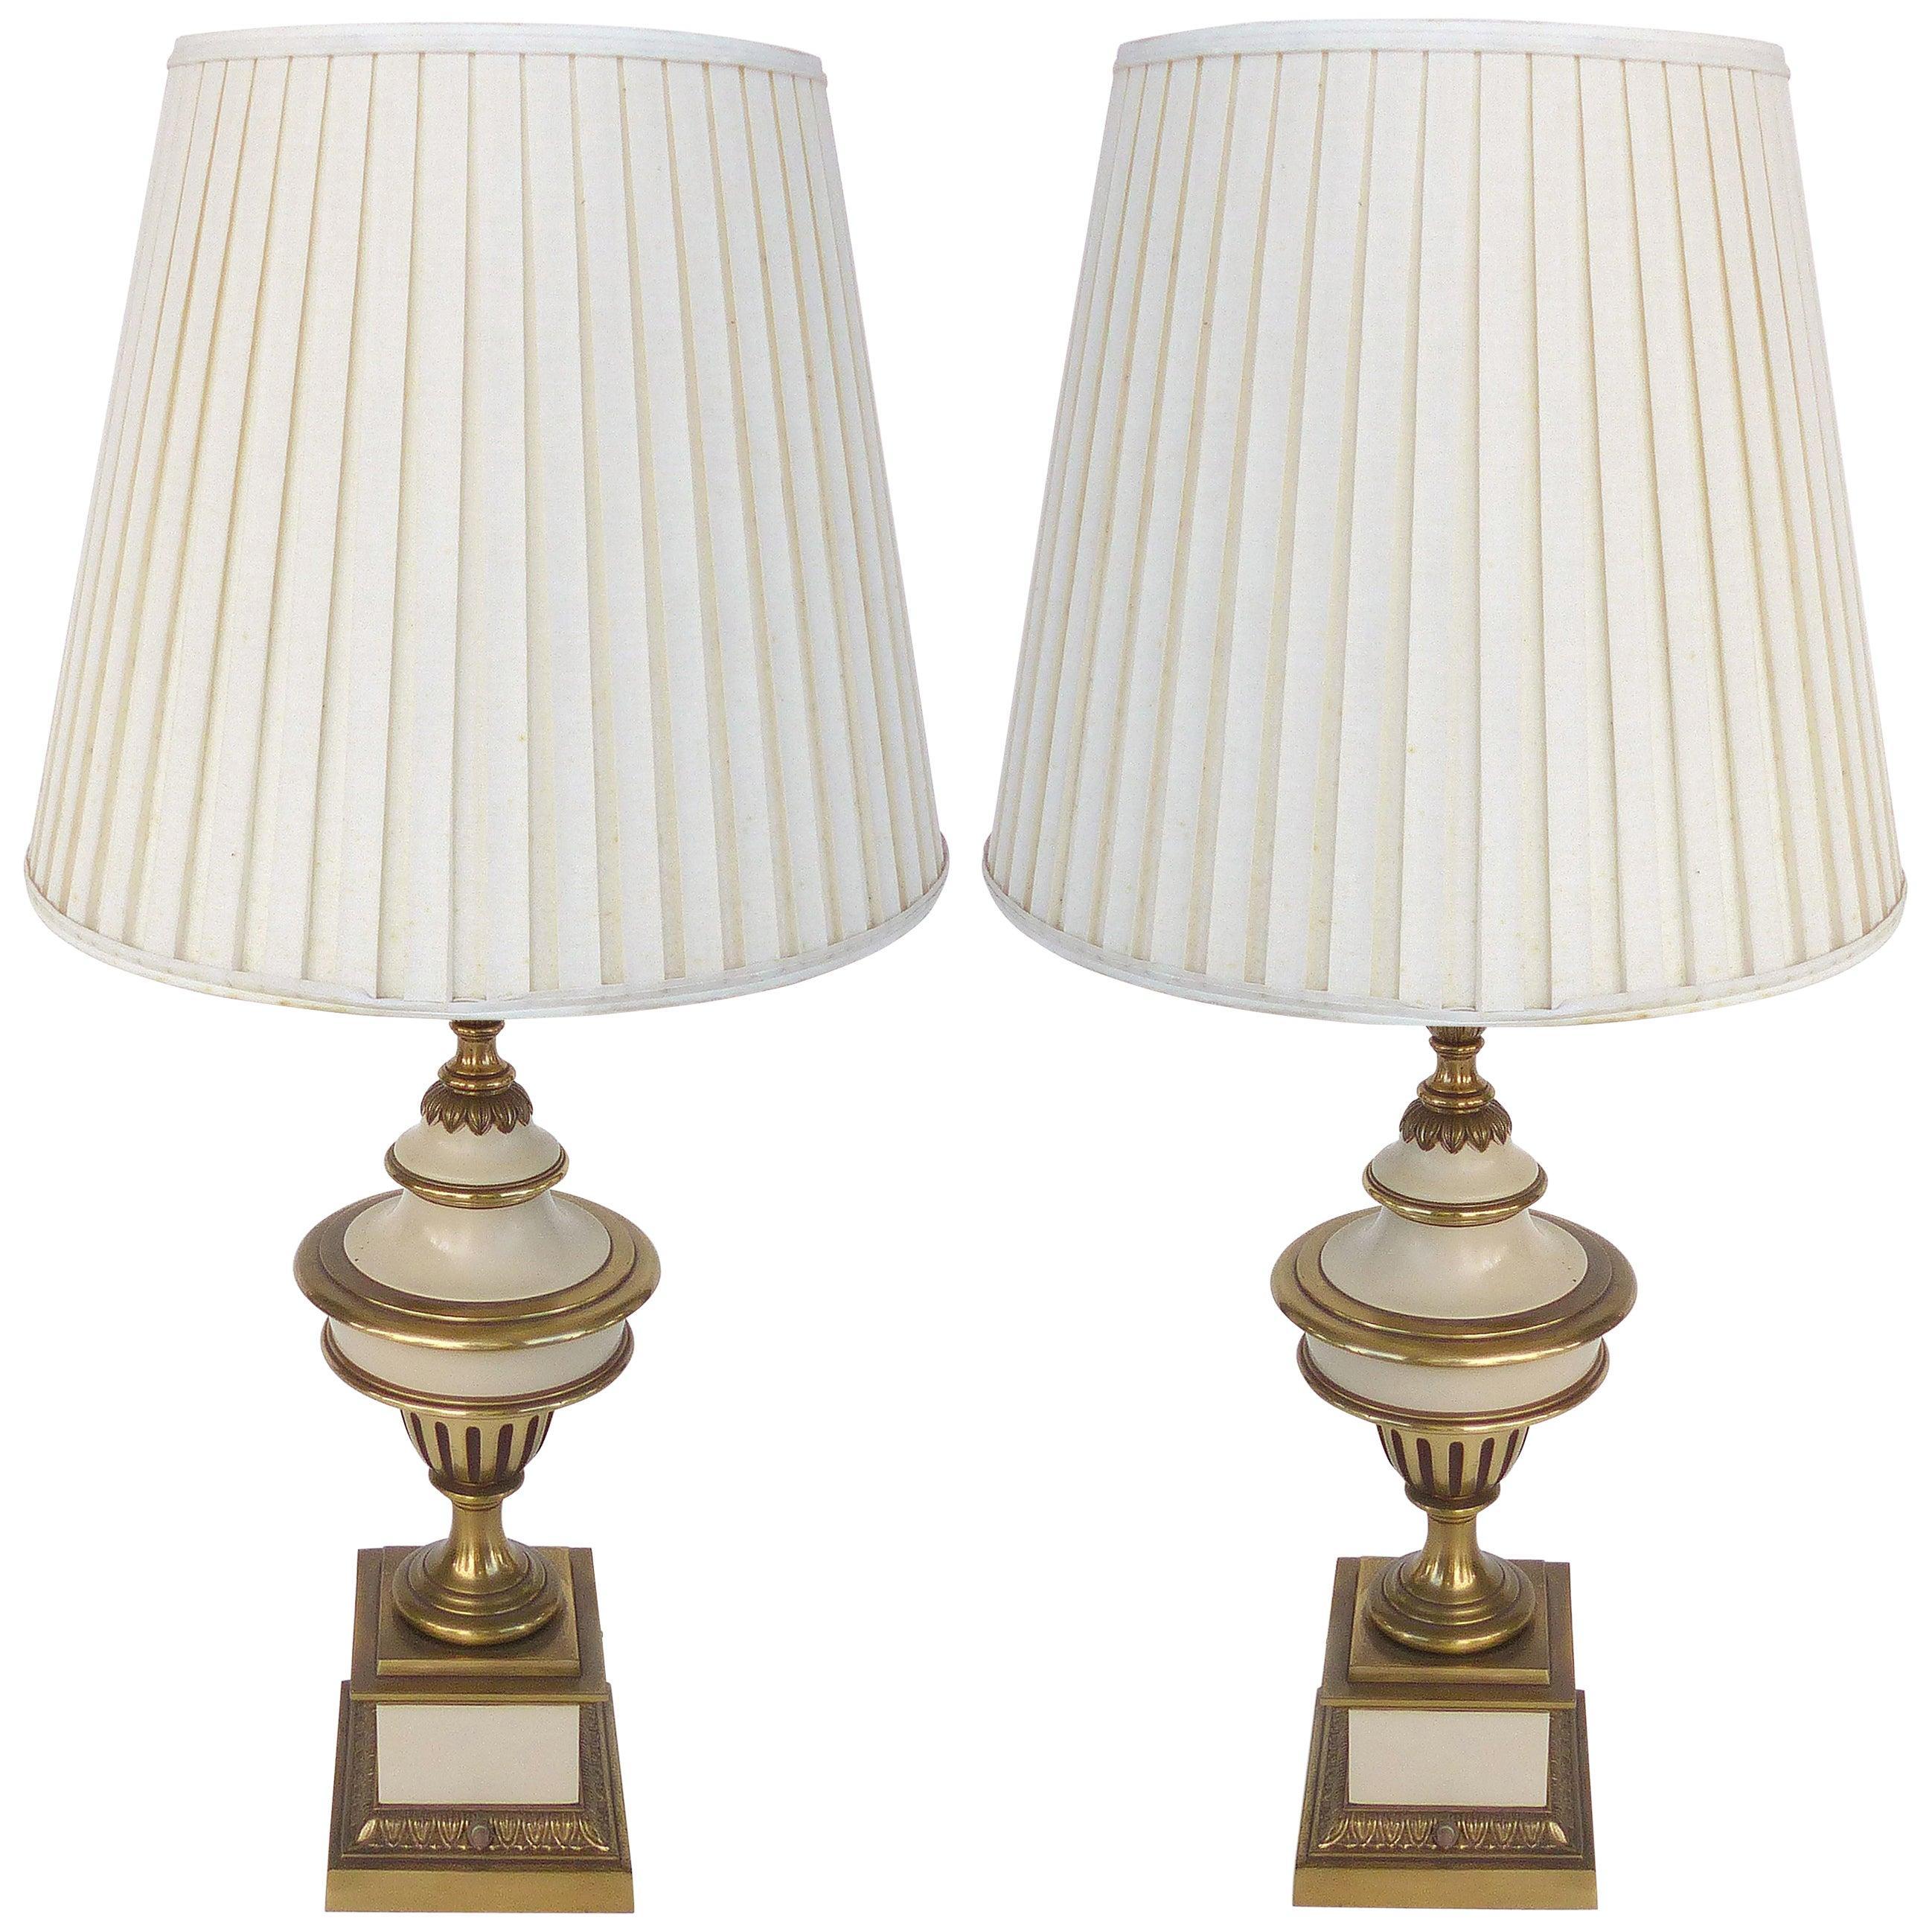 Brass Stiffel Table Lamps, Pair